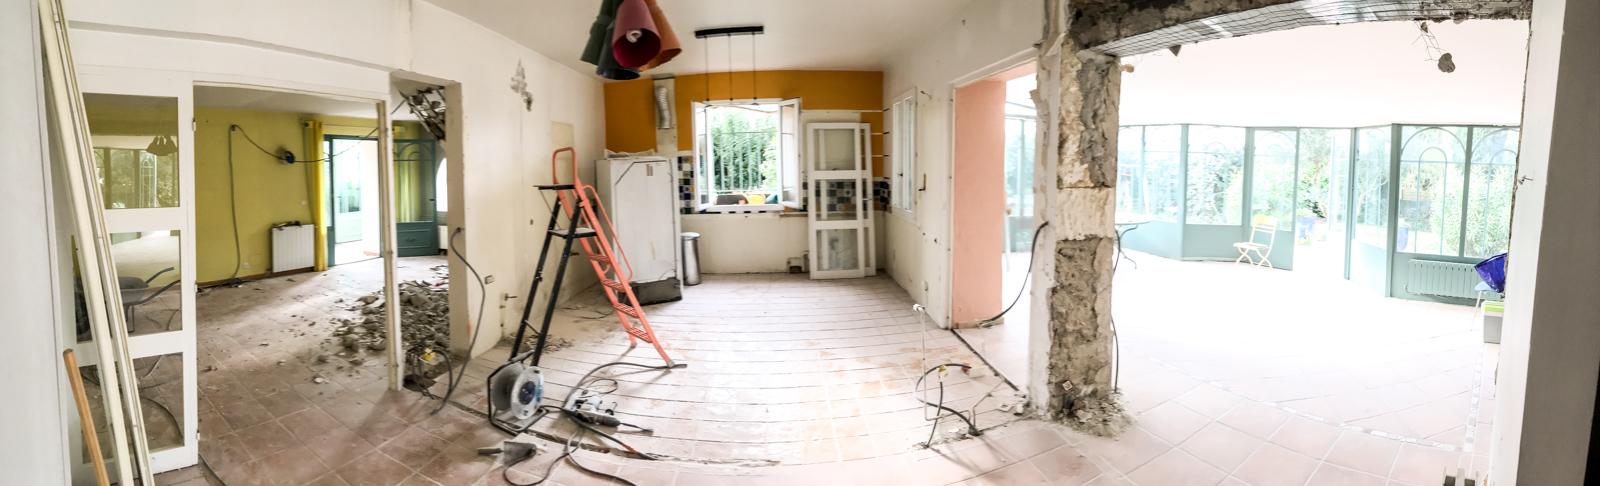 architecte montpellier renovation extension neuf